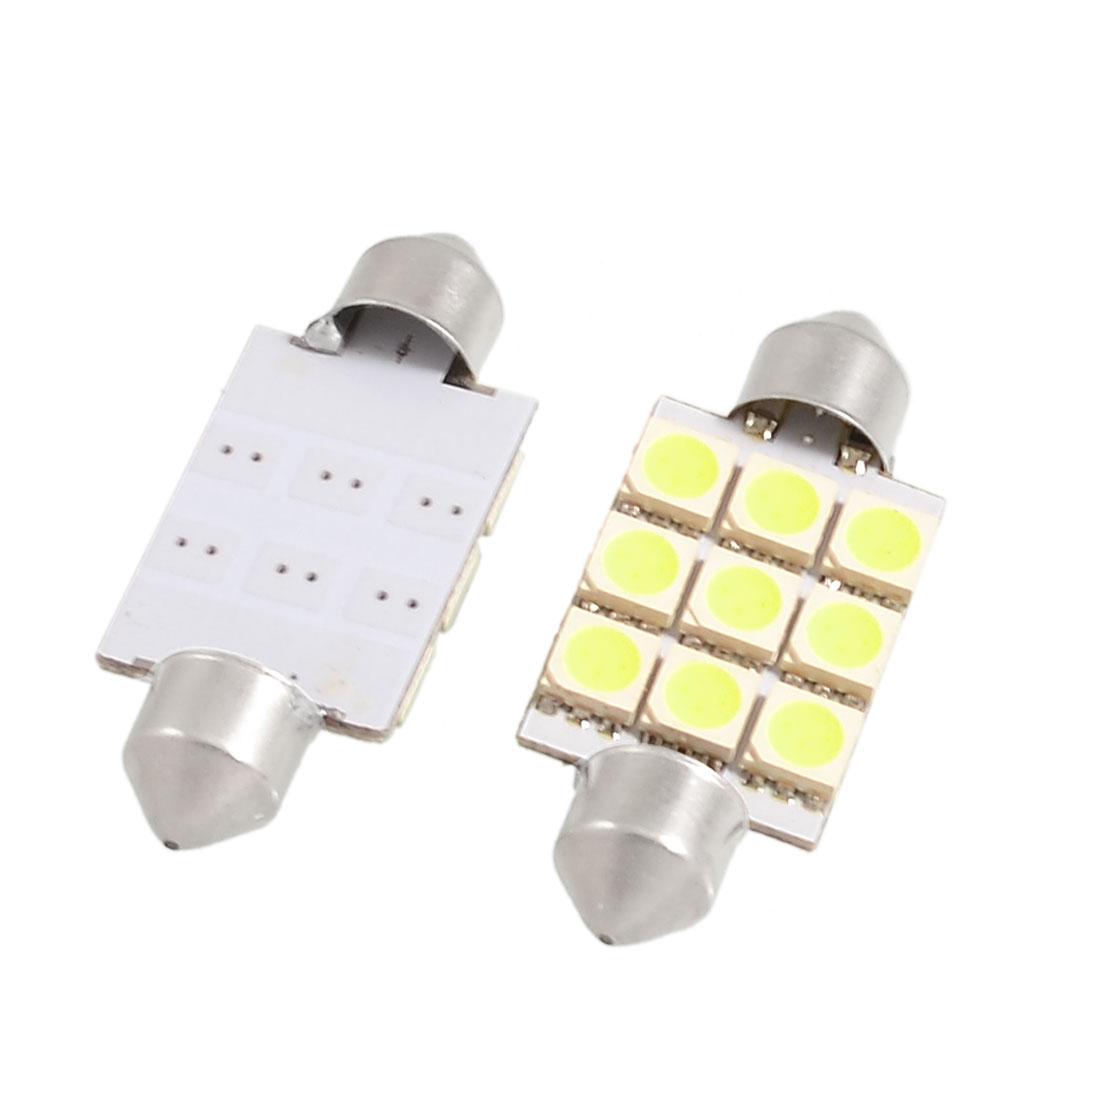 2 Pcs White 41mm 5050 SMD 9 LED Car Interior Dome Festoon Light Bulb DC 12V